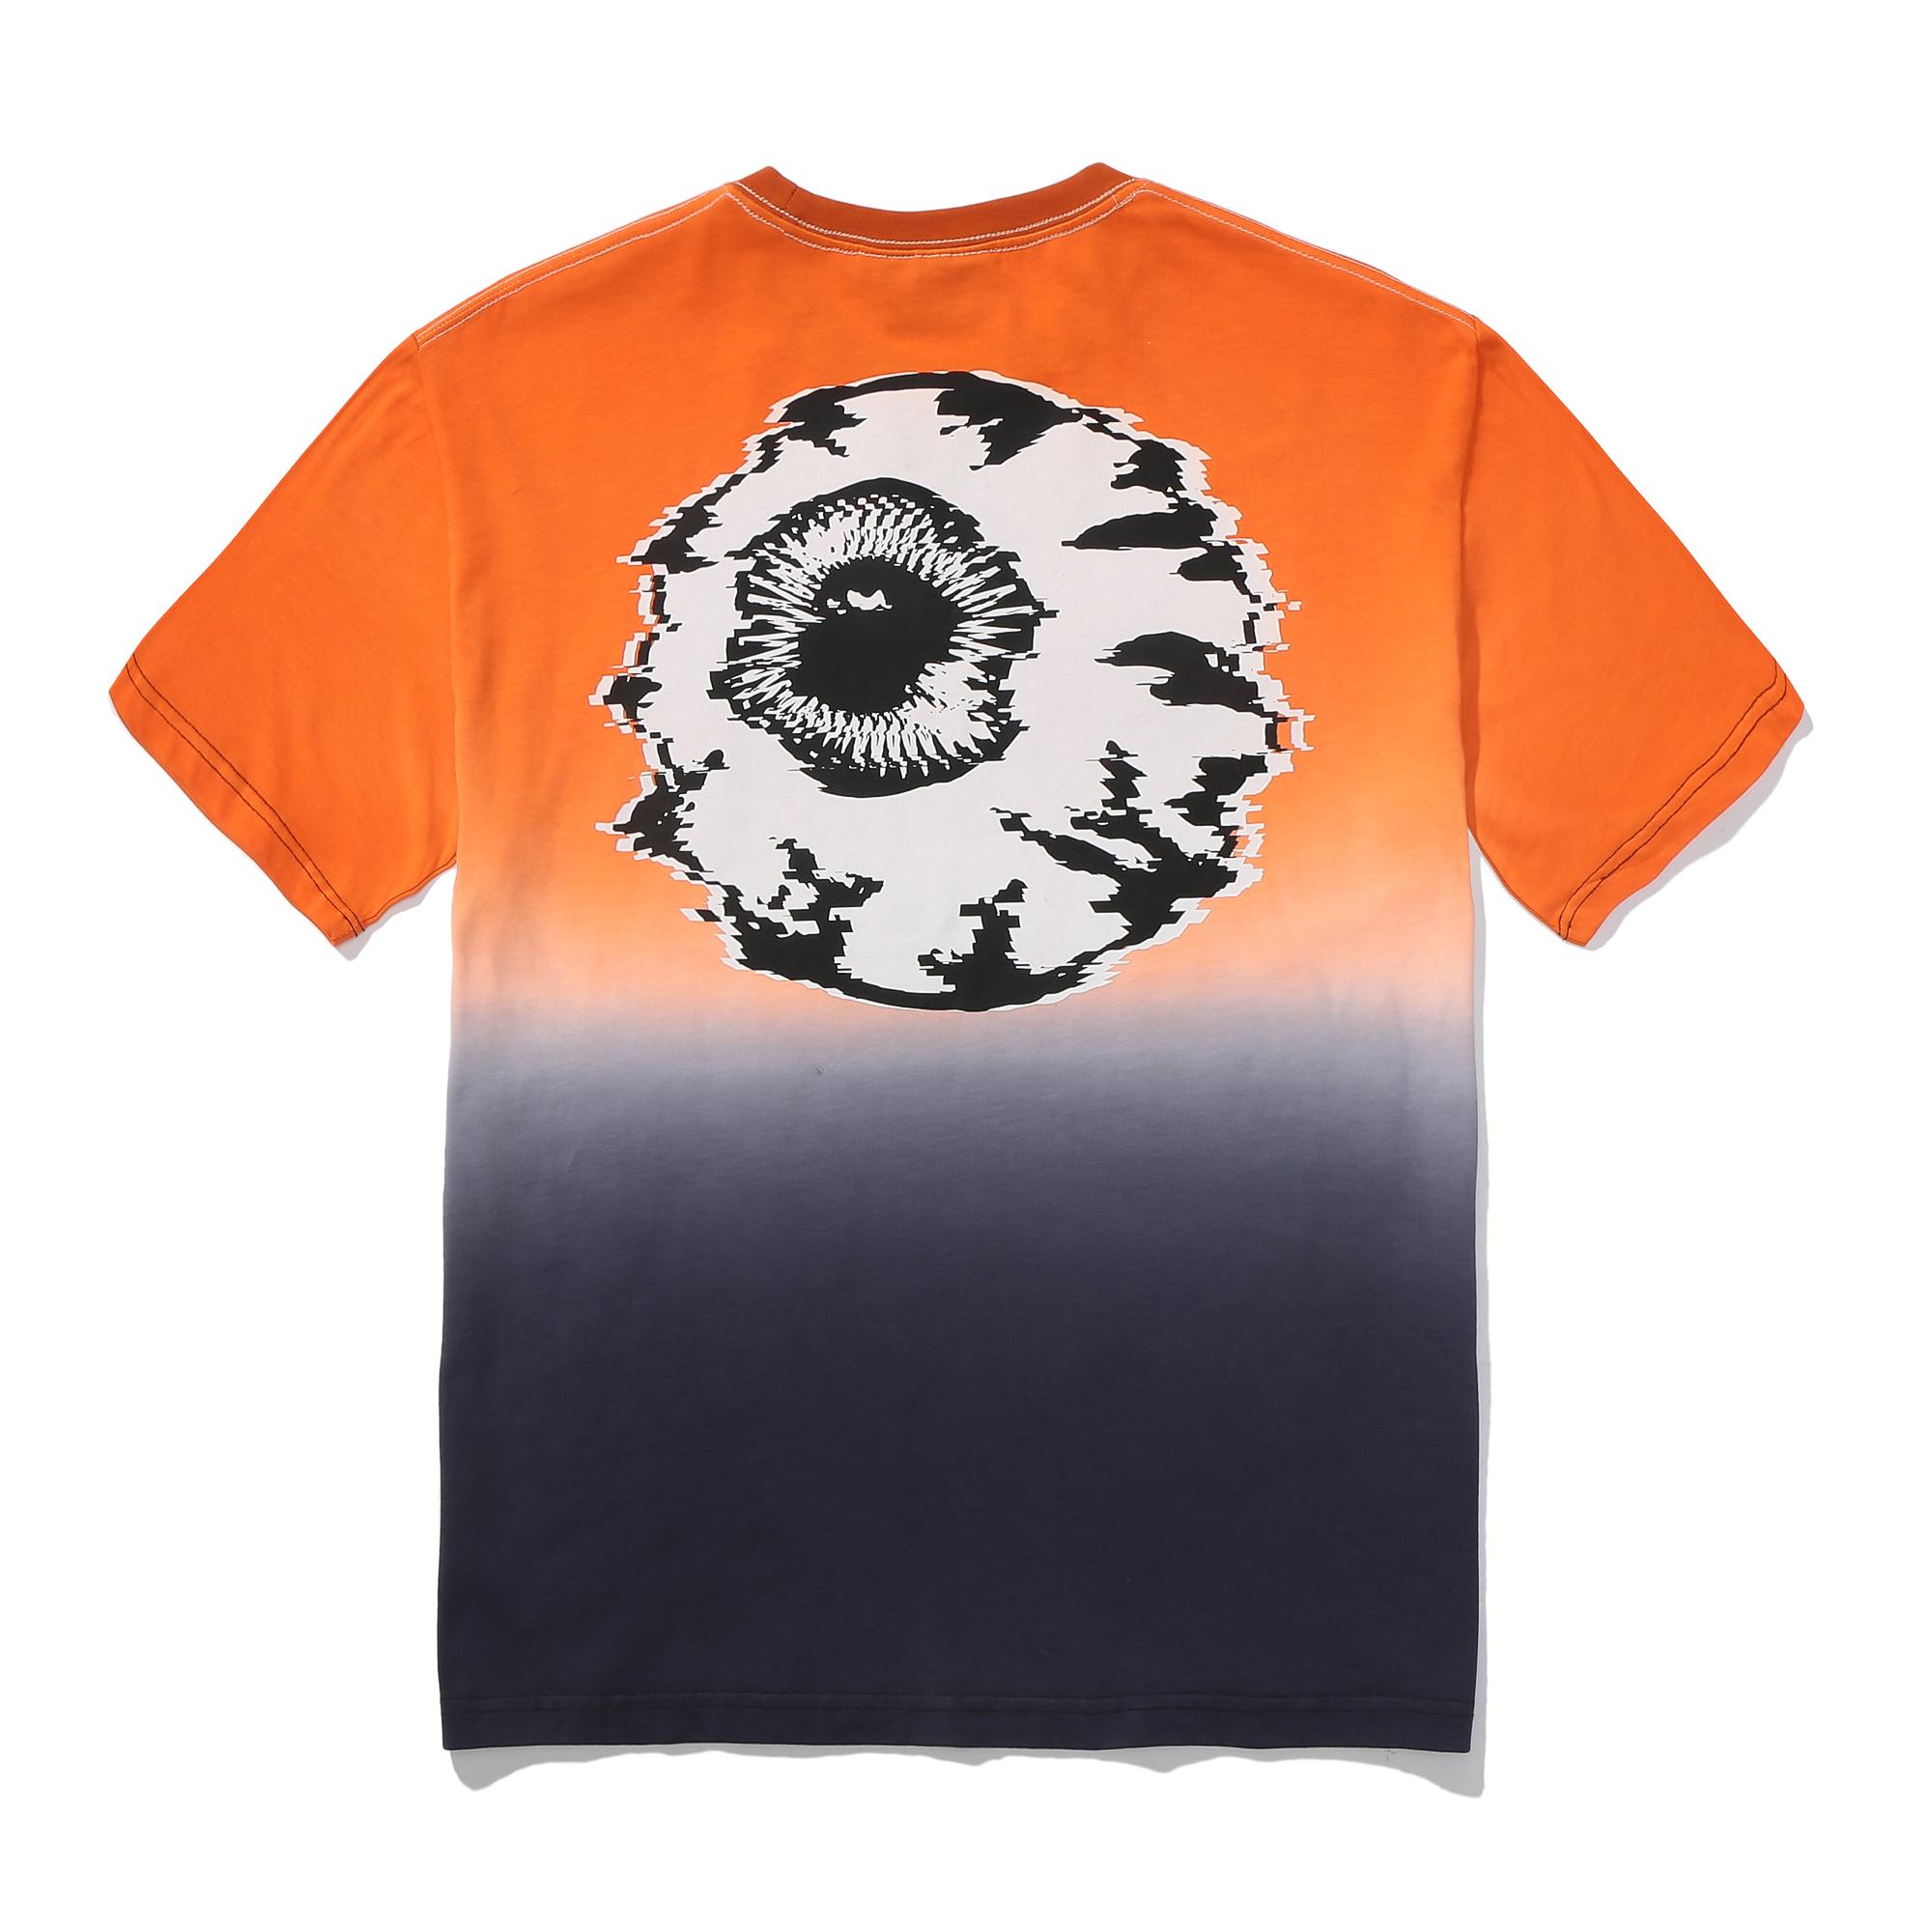 Melty Keep-Watch Dip Dye Ombre T-Shirt